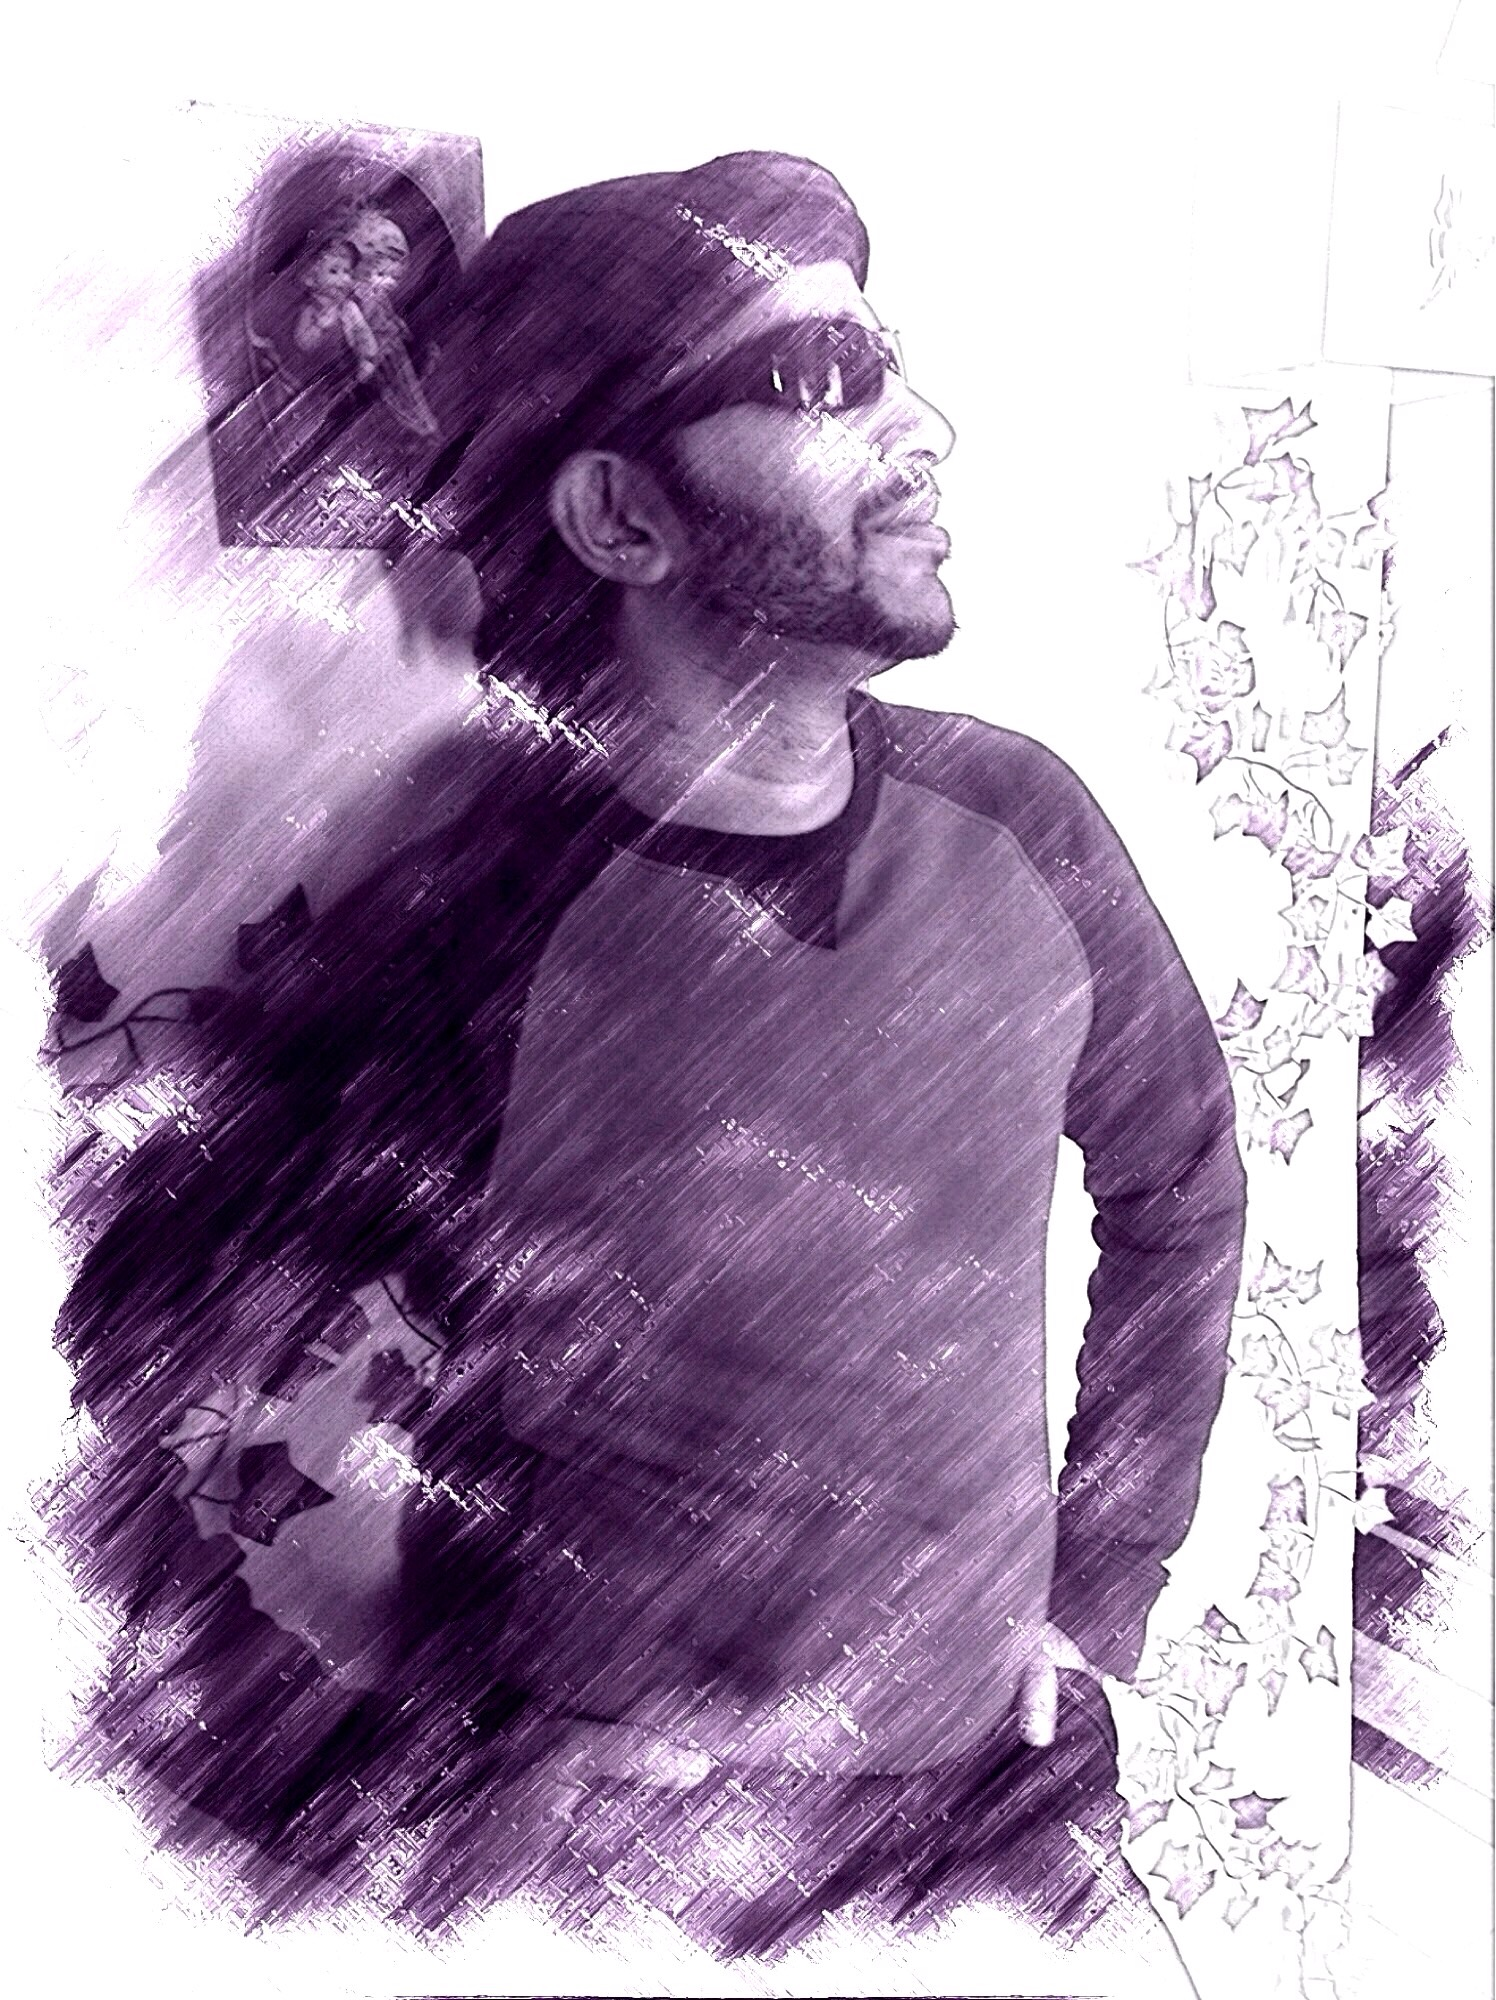 faris aboarish profile image